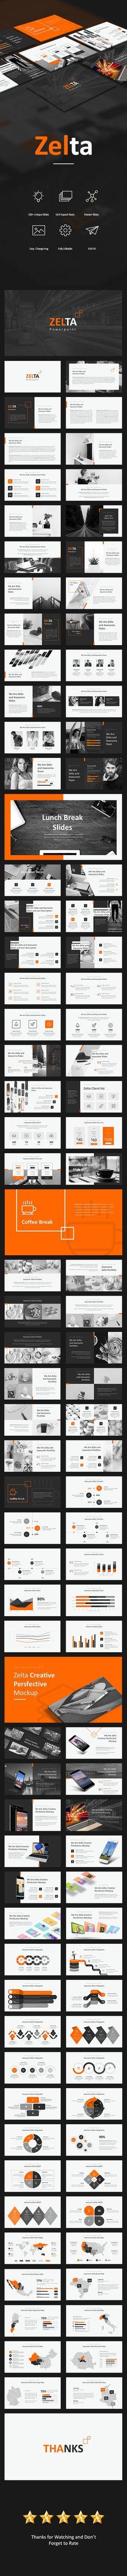 Zelta Powerpoint - PowerPoint Templates Presentation Templates